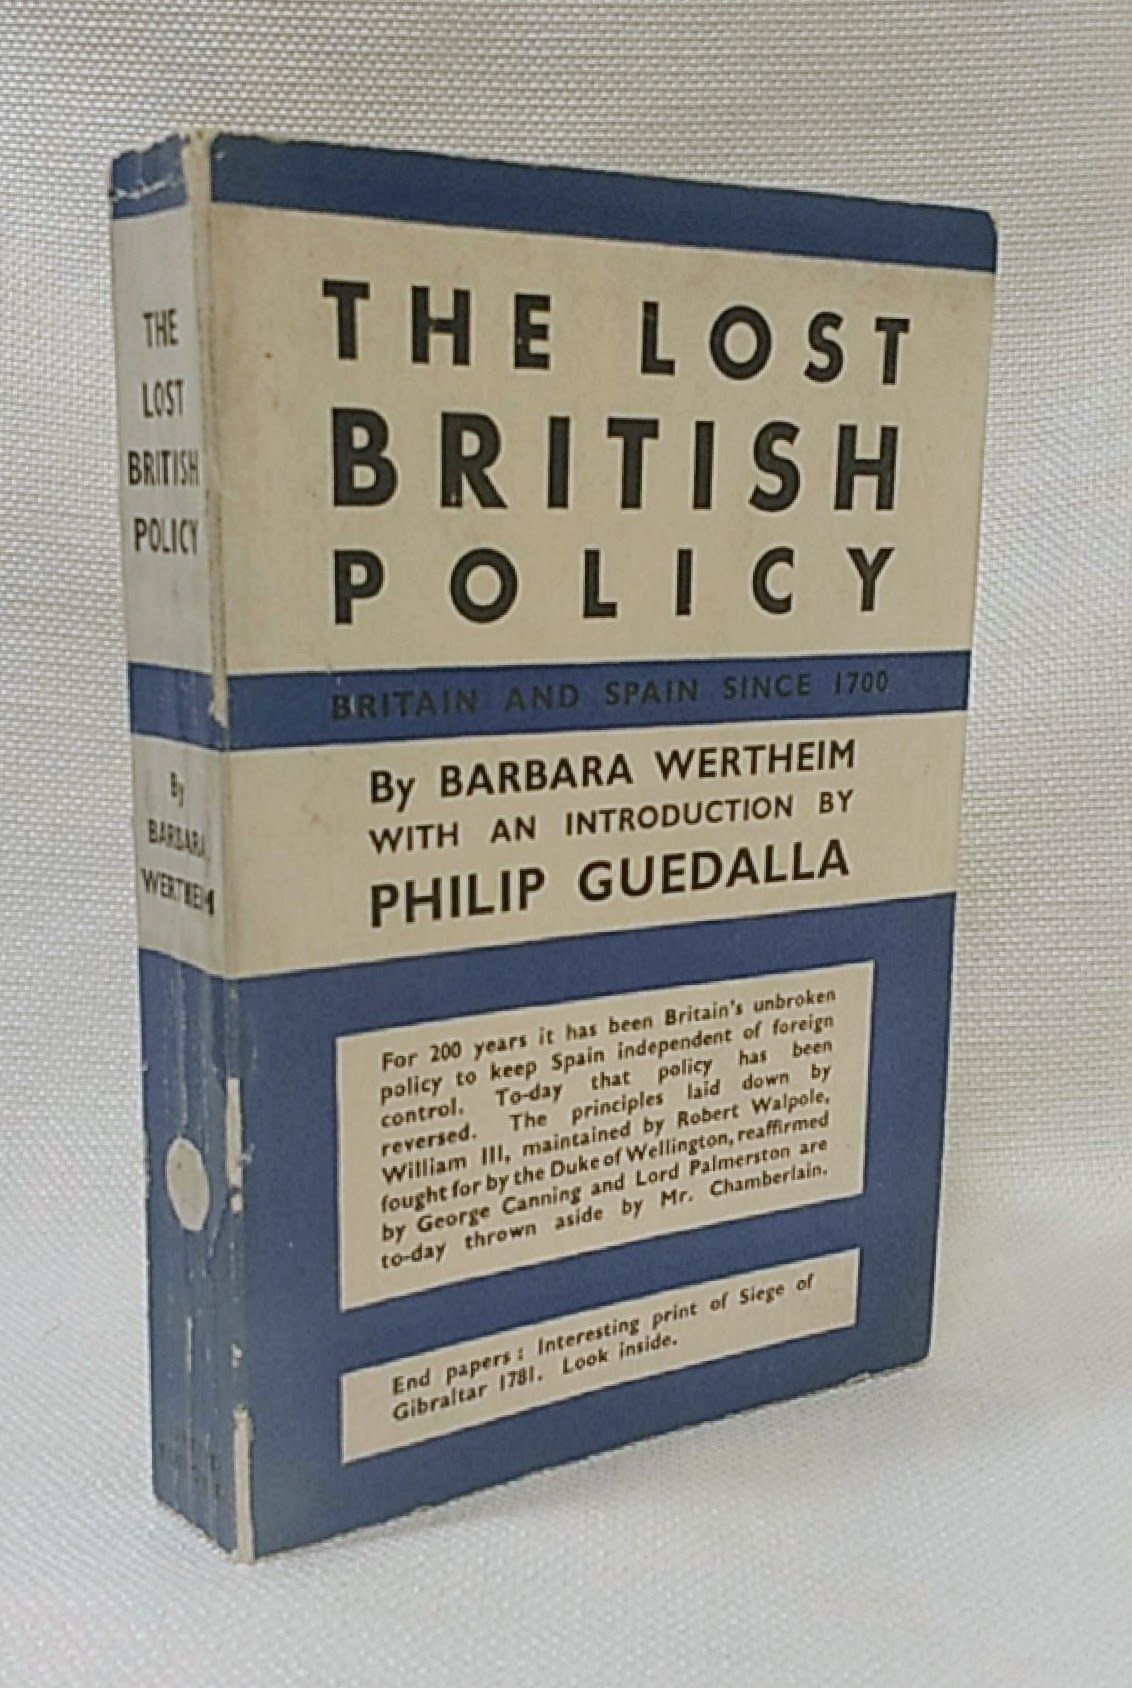 THE LOST BRITISH POLICY: Britain and Spain Since 1700., (Tuchman, Barbara) Barbara Wertheim.